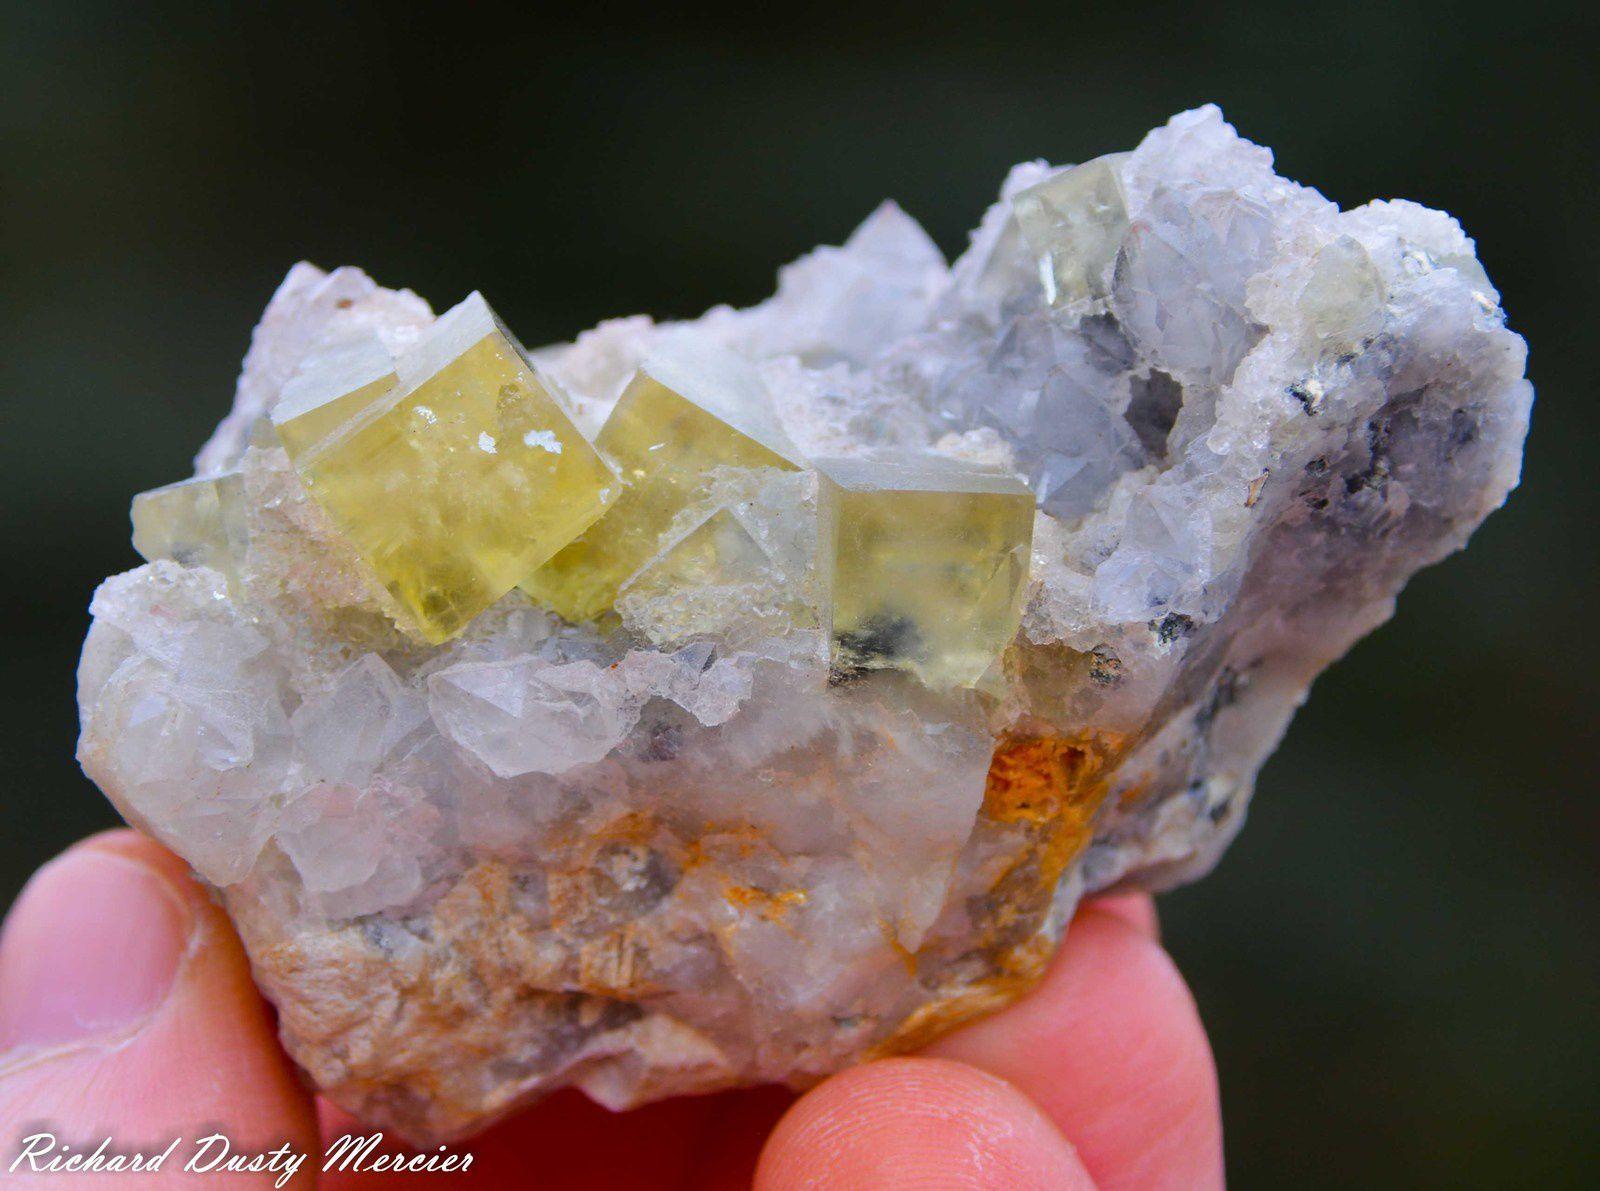 Fluorite (Fluorine) with Quartz from Aouli, Midelt, Morocco (Maroc) (size: Small Miniature)